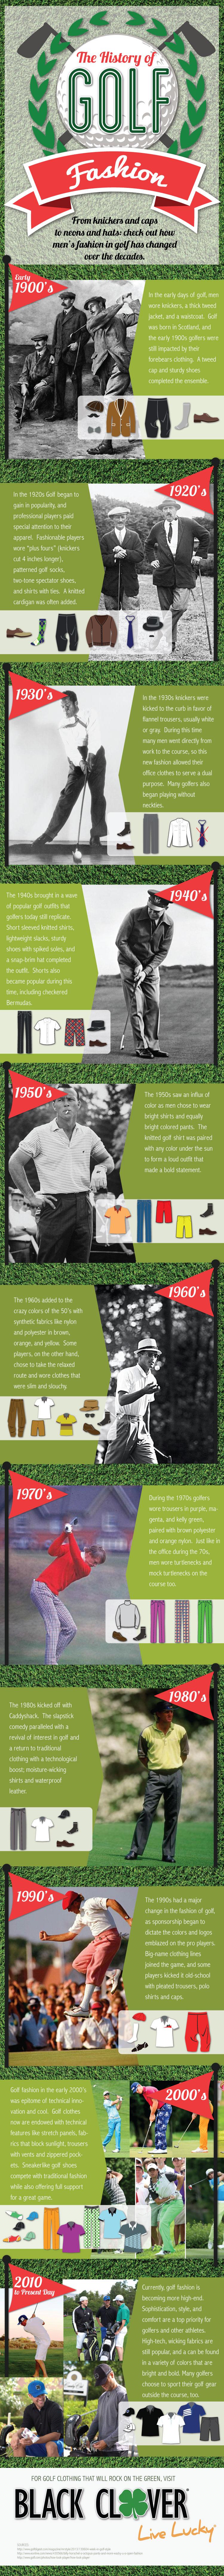 This History Of Golf Fashion